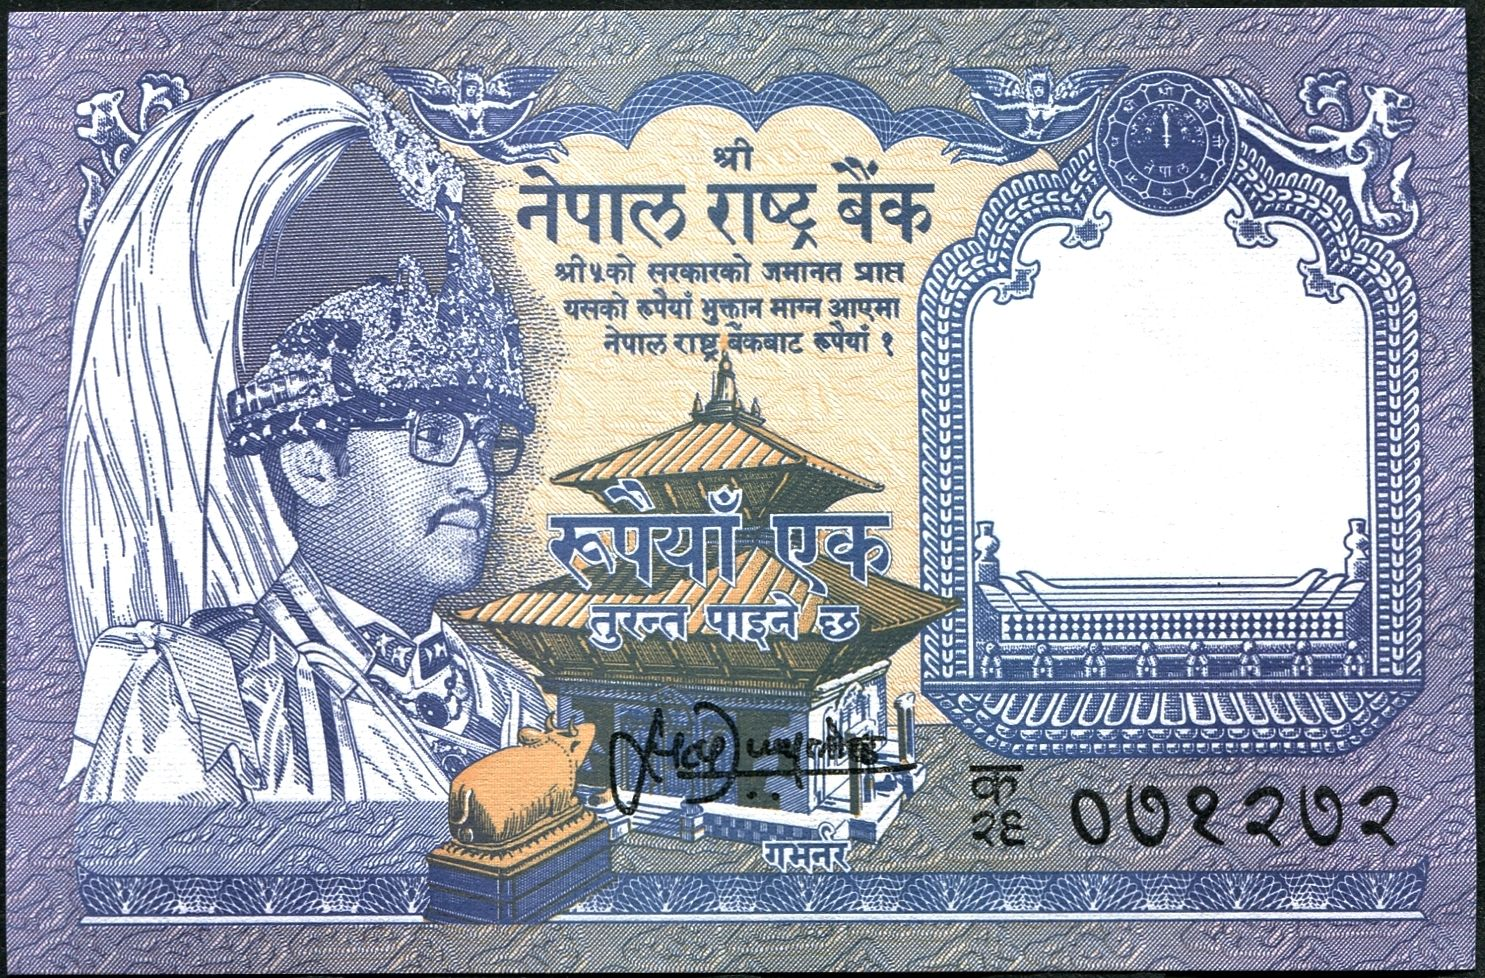 Nepal (P 37a.2) - 5 Rupee Banknote (2010) - UNC